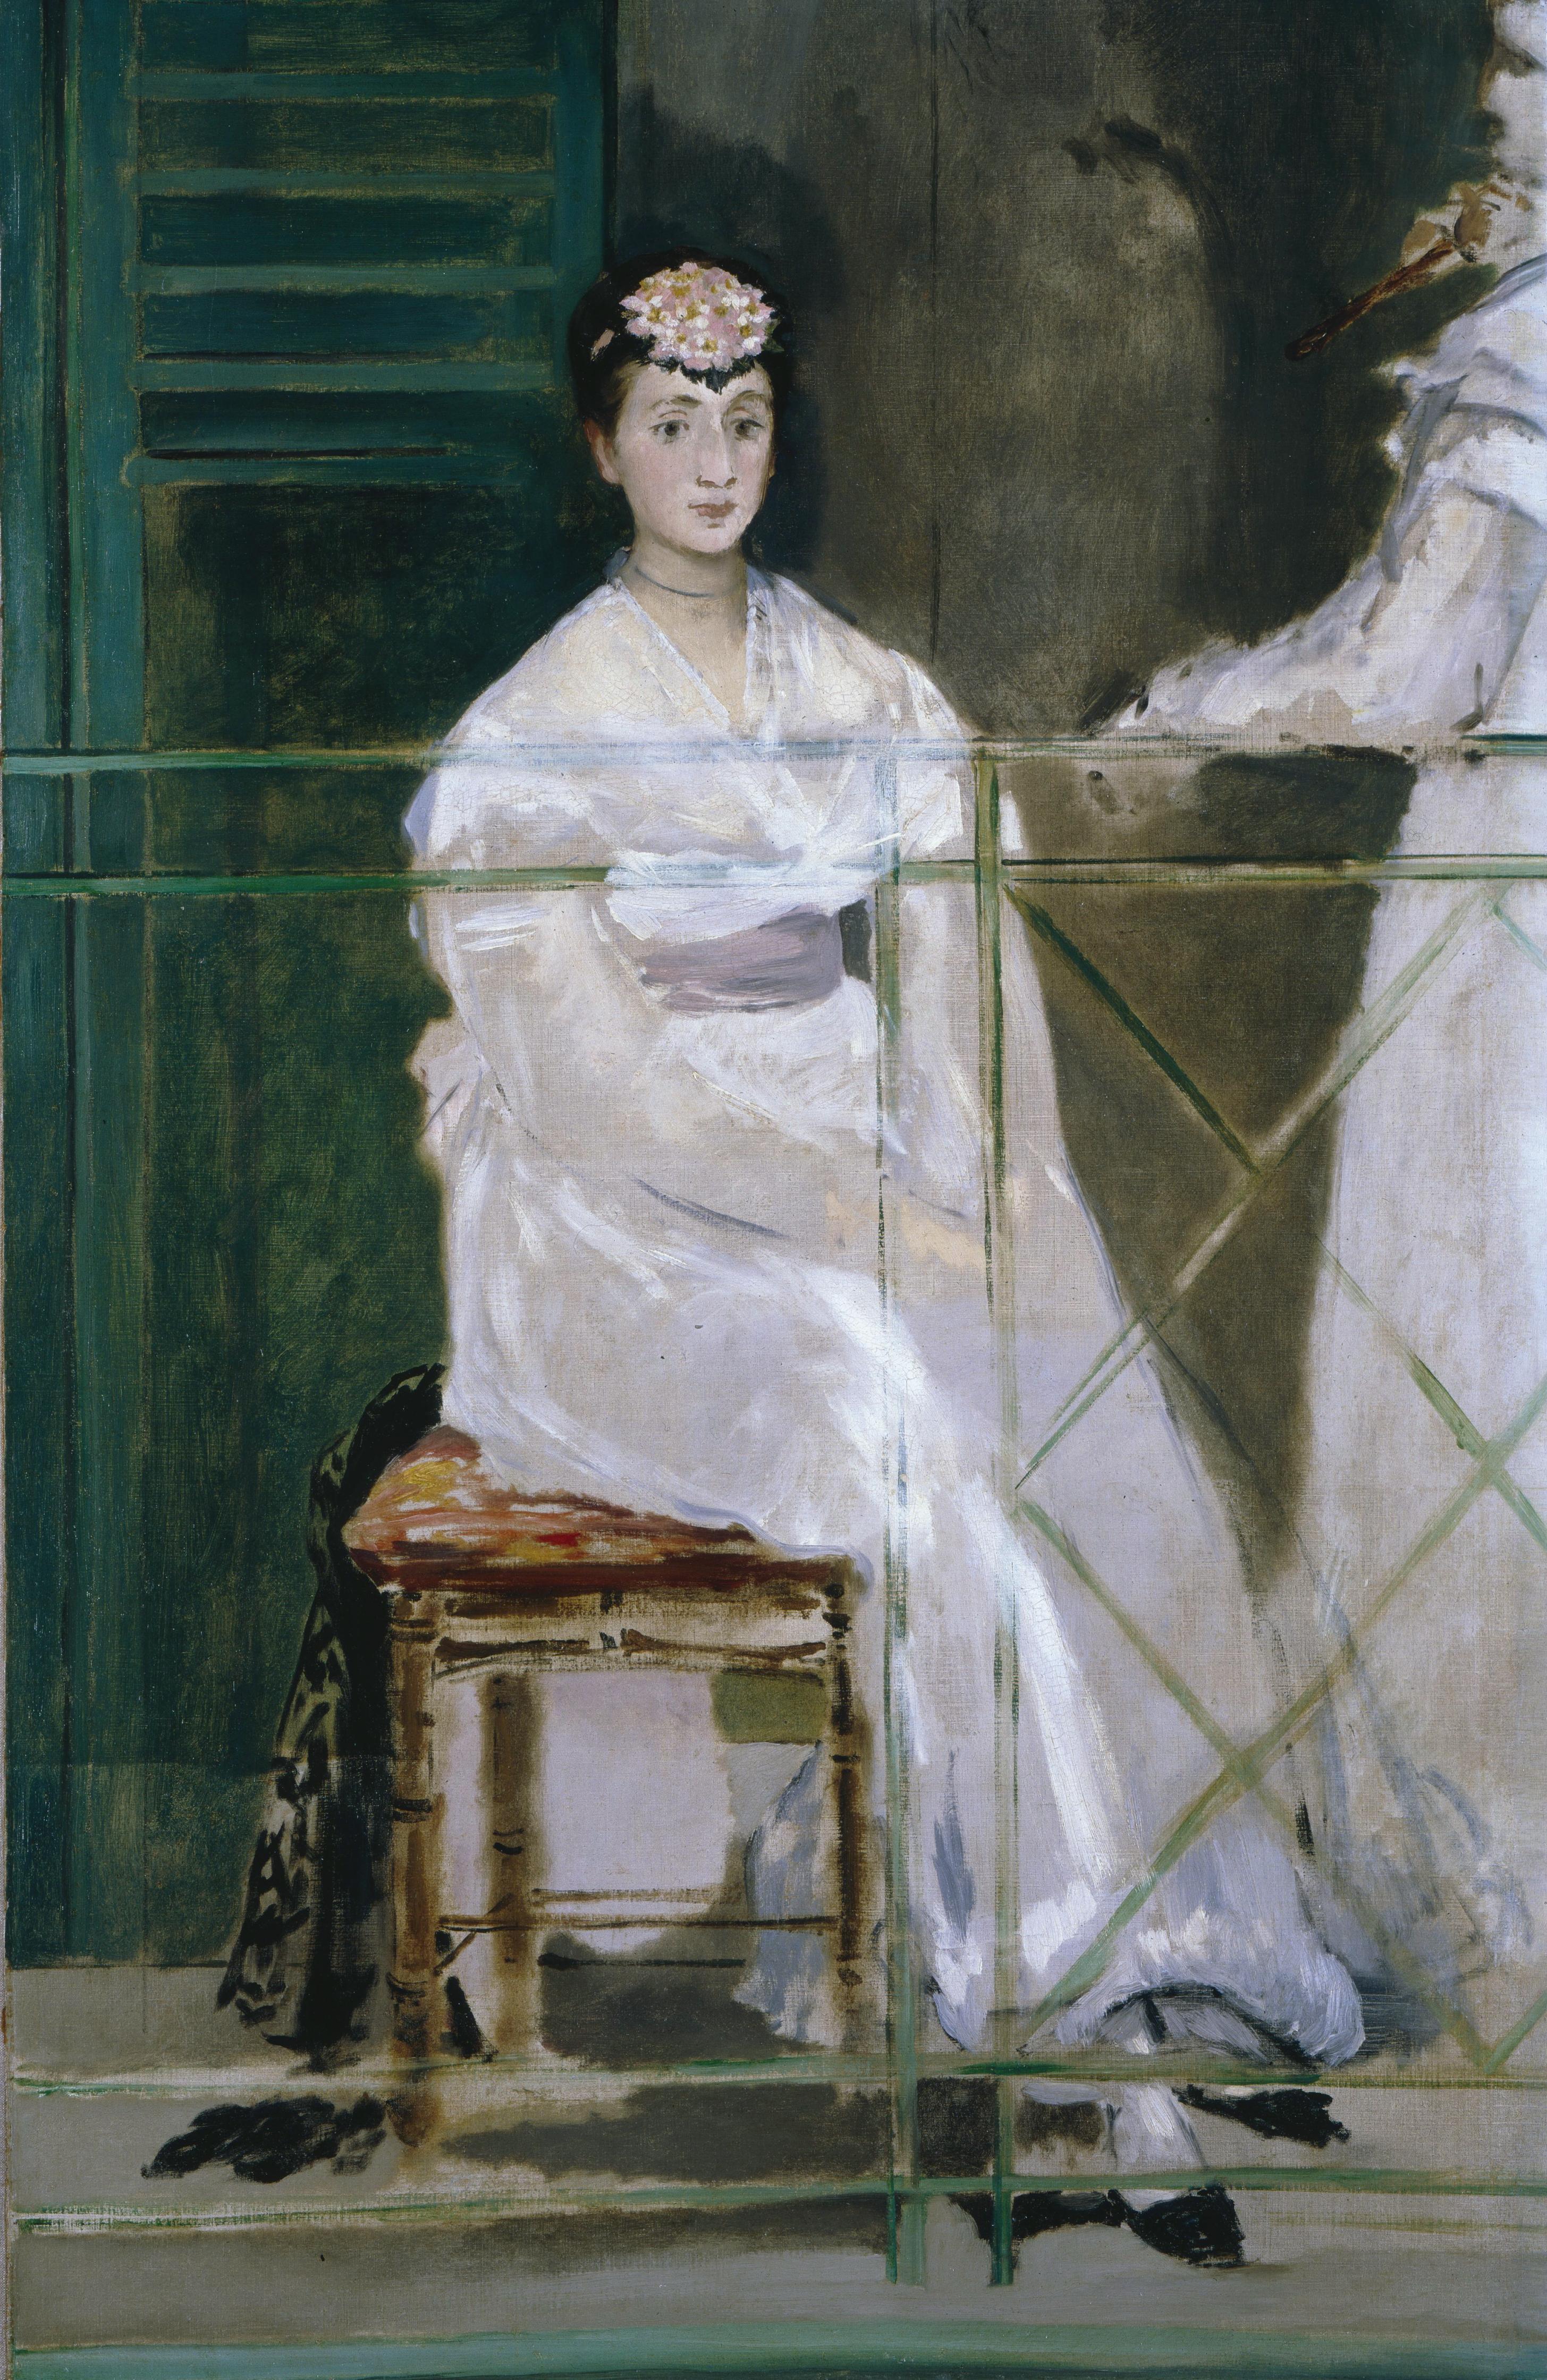 http://upload.wikimedia.org/wikipedia/commons/6/66/Edouard_Manet_-_Portrait_of_Mademoiselle_Claus.jpg